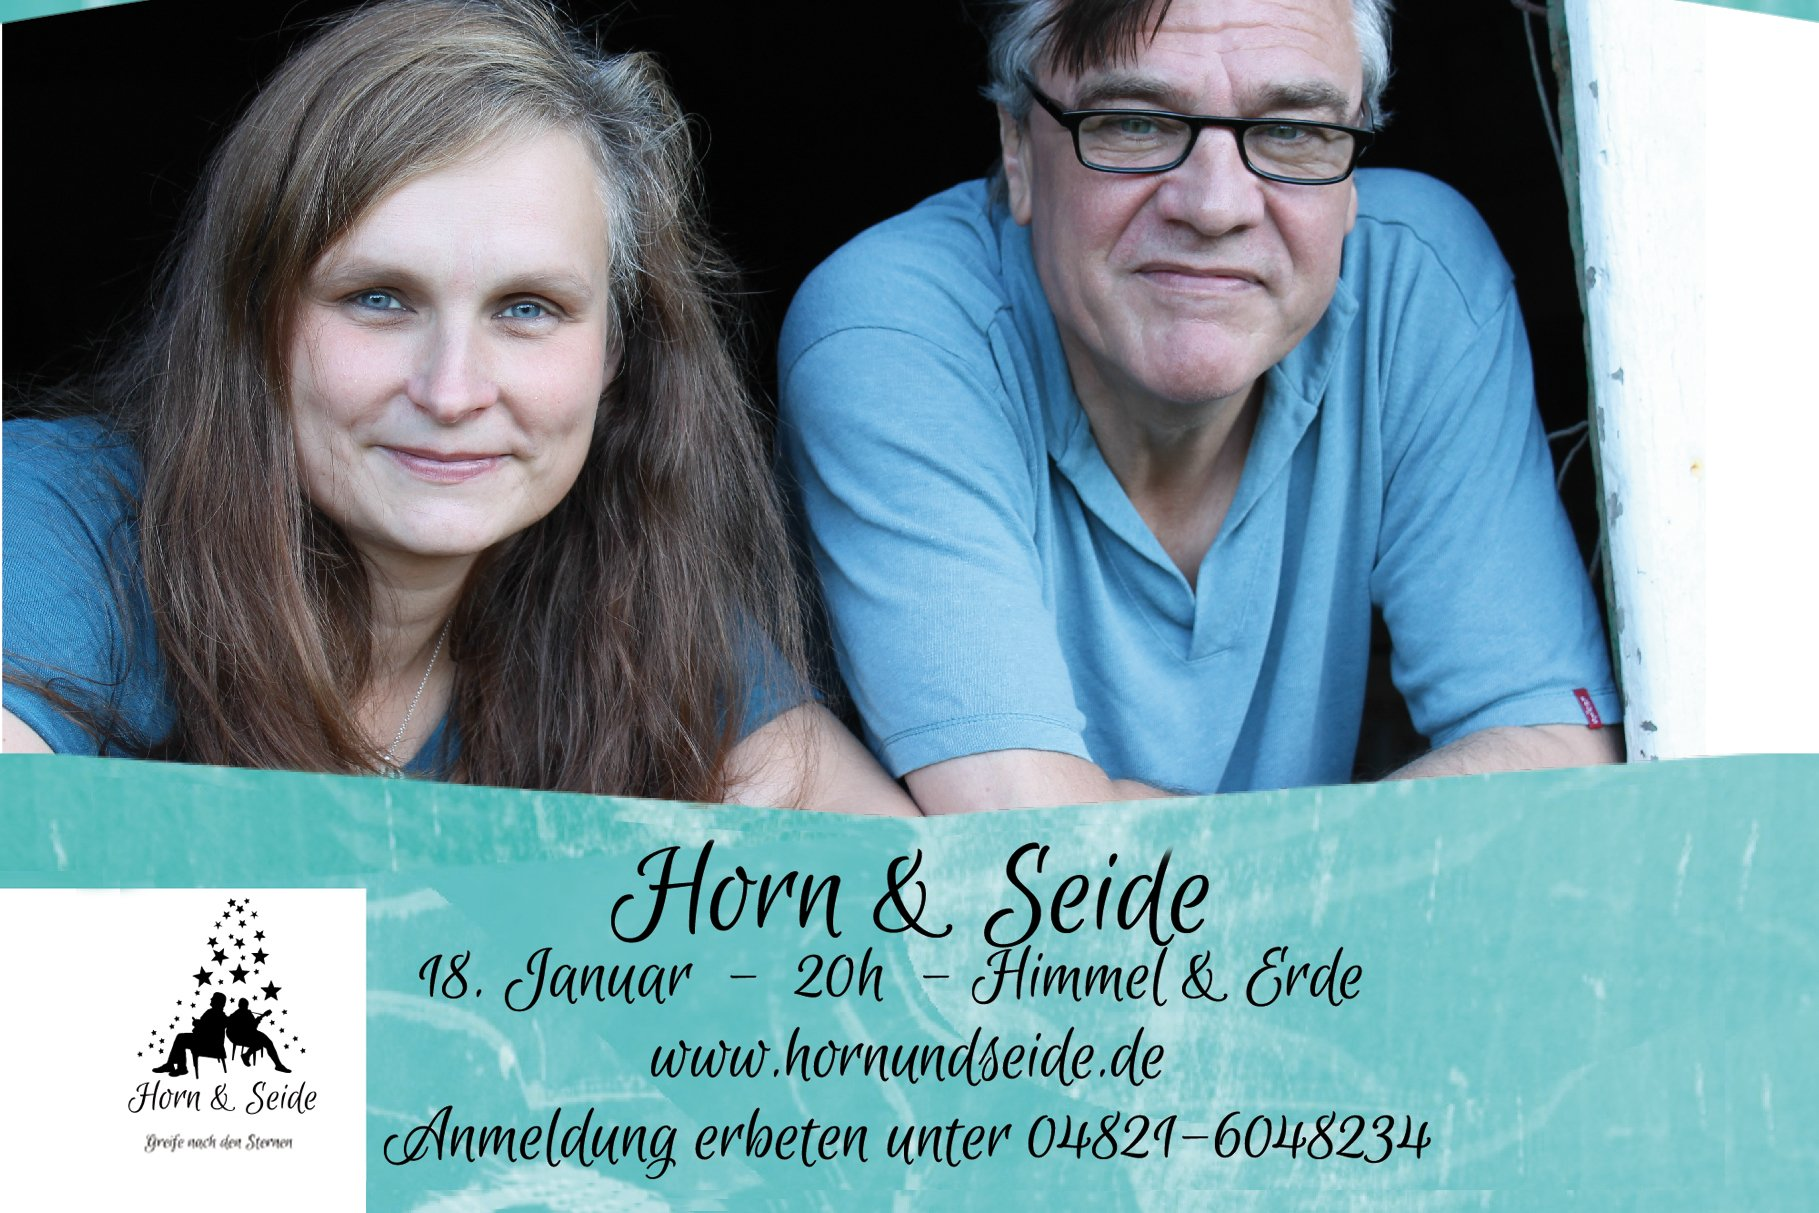 Horn & Seide